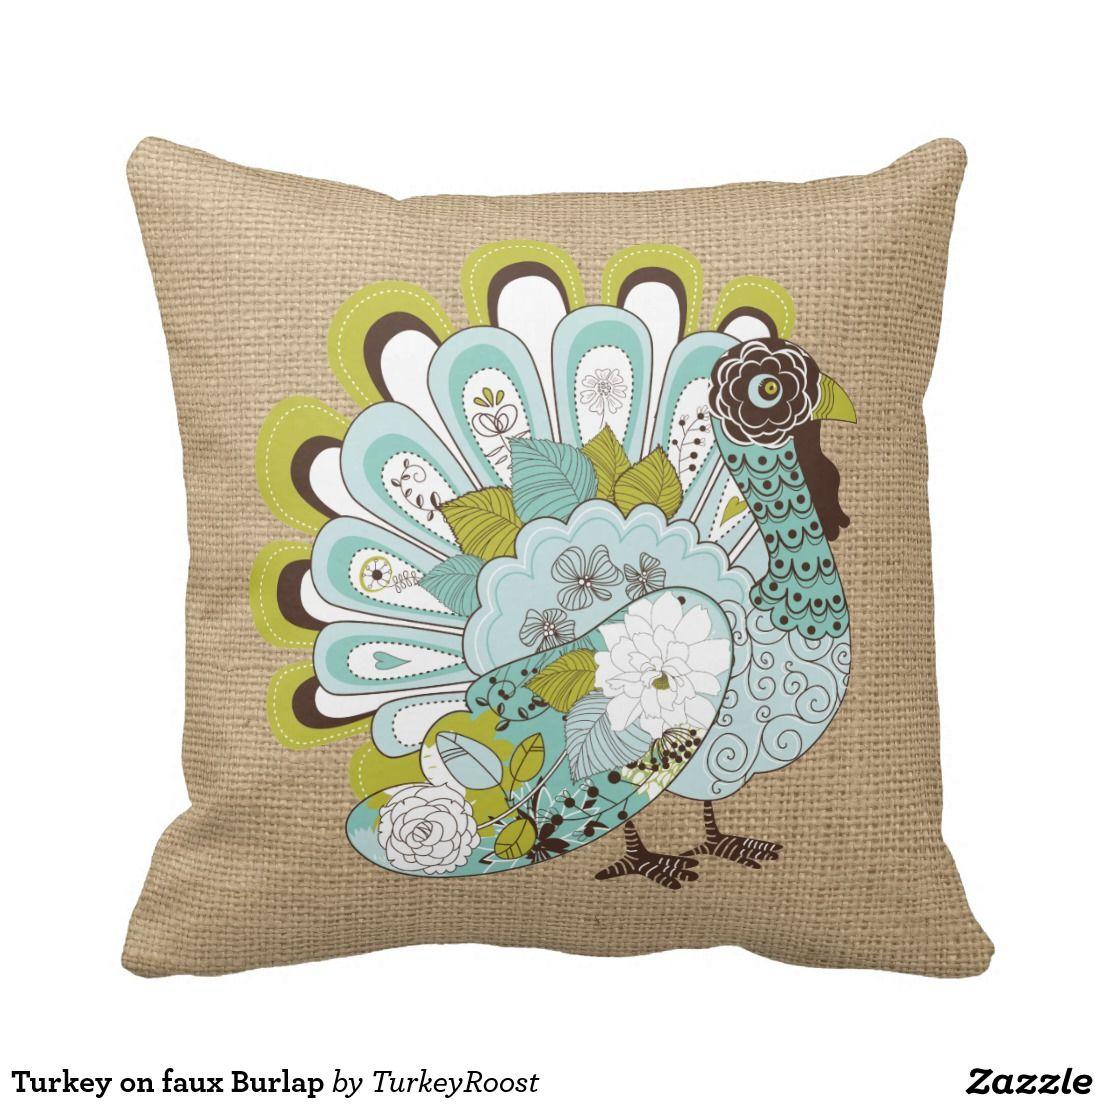 Turkey on faux Burlap Throw Pillow | Burlap throw pillows, Burlap ...